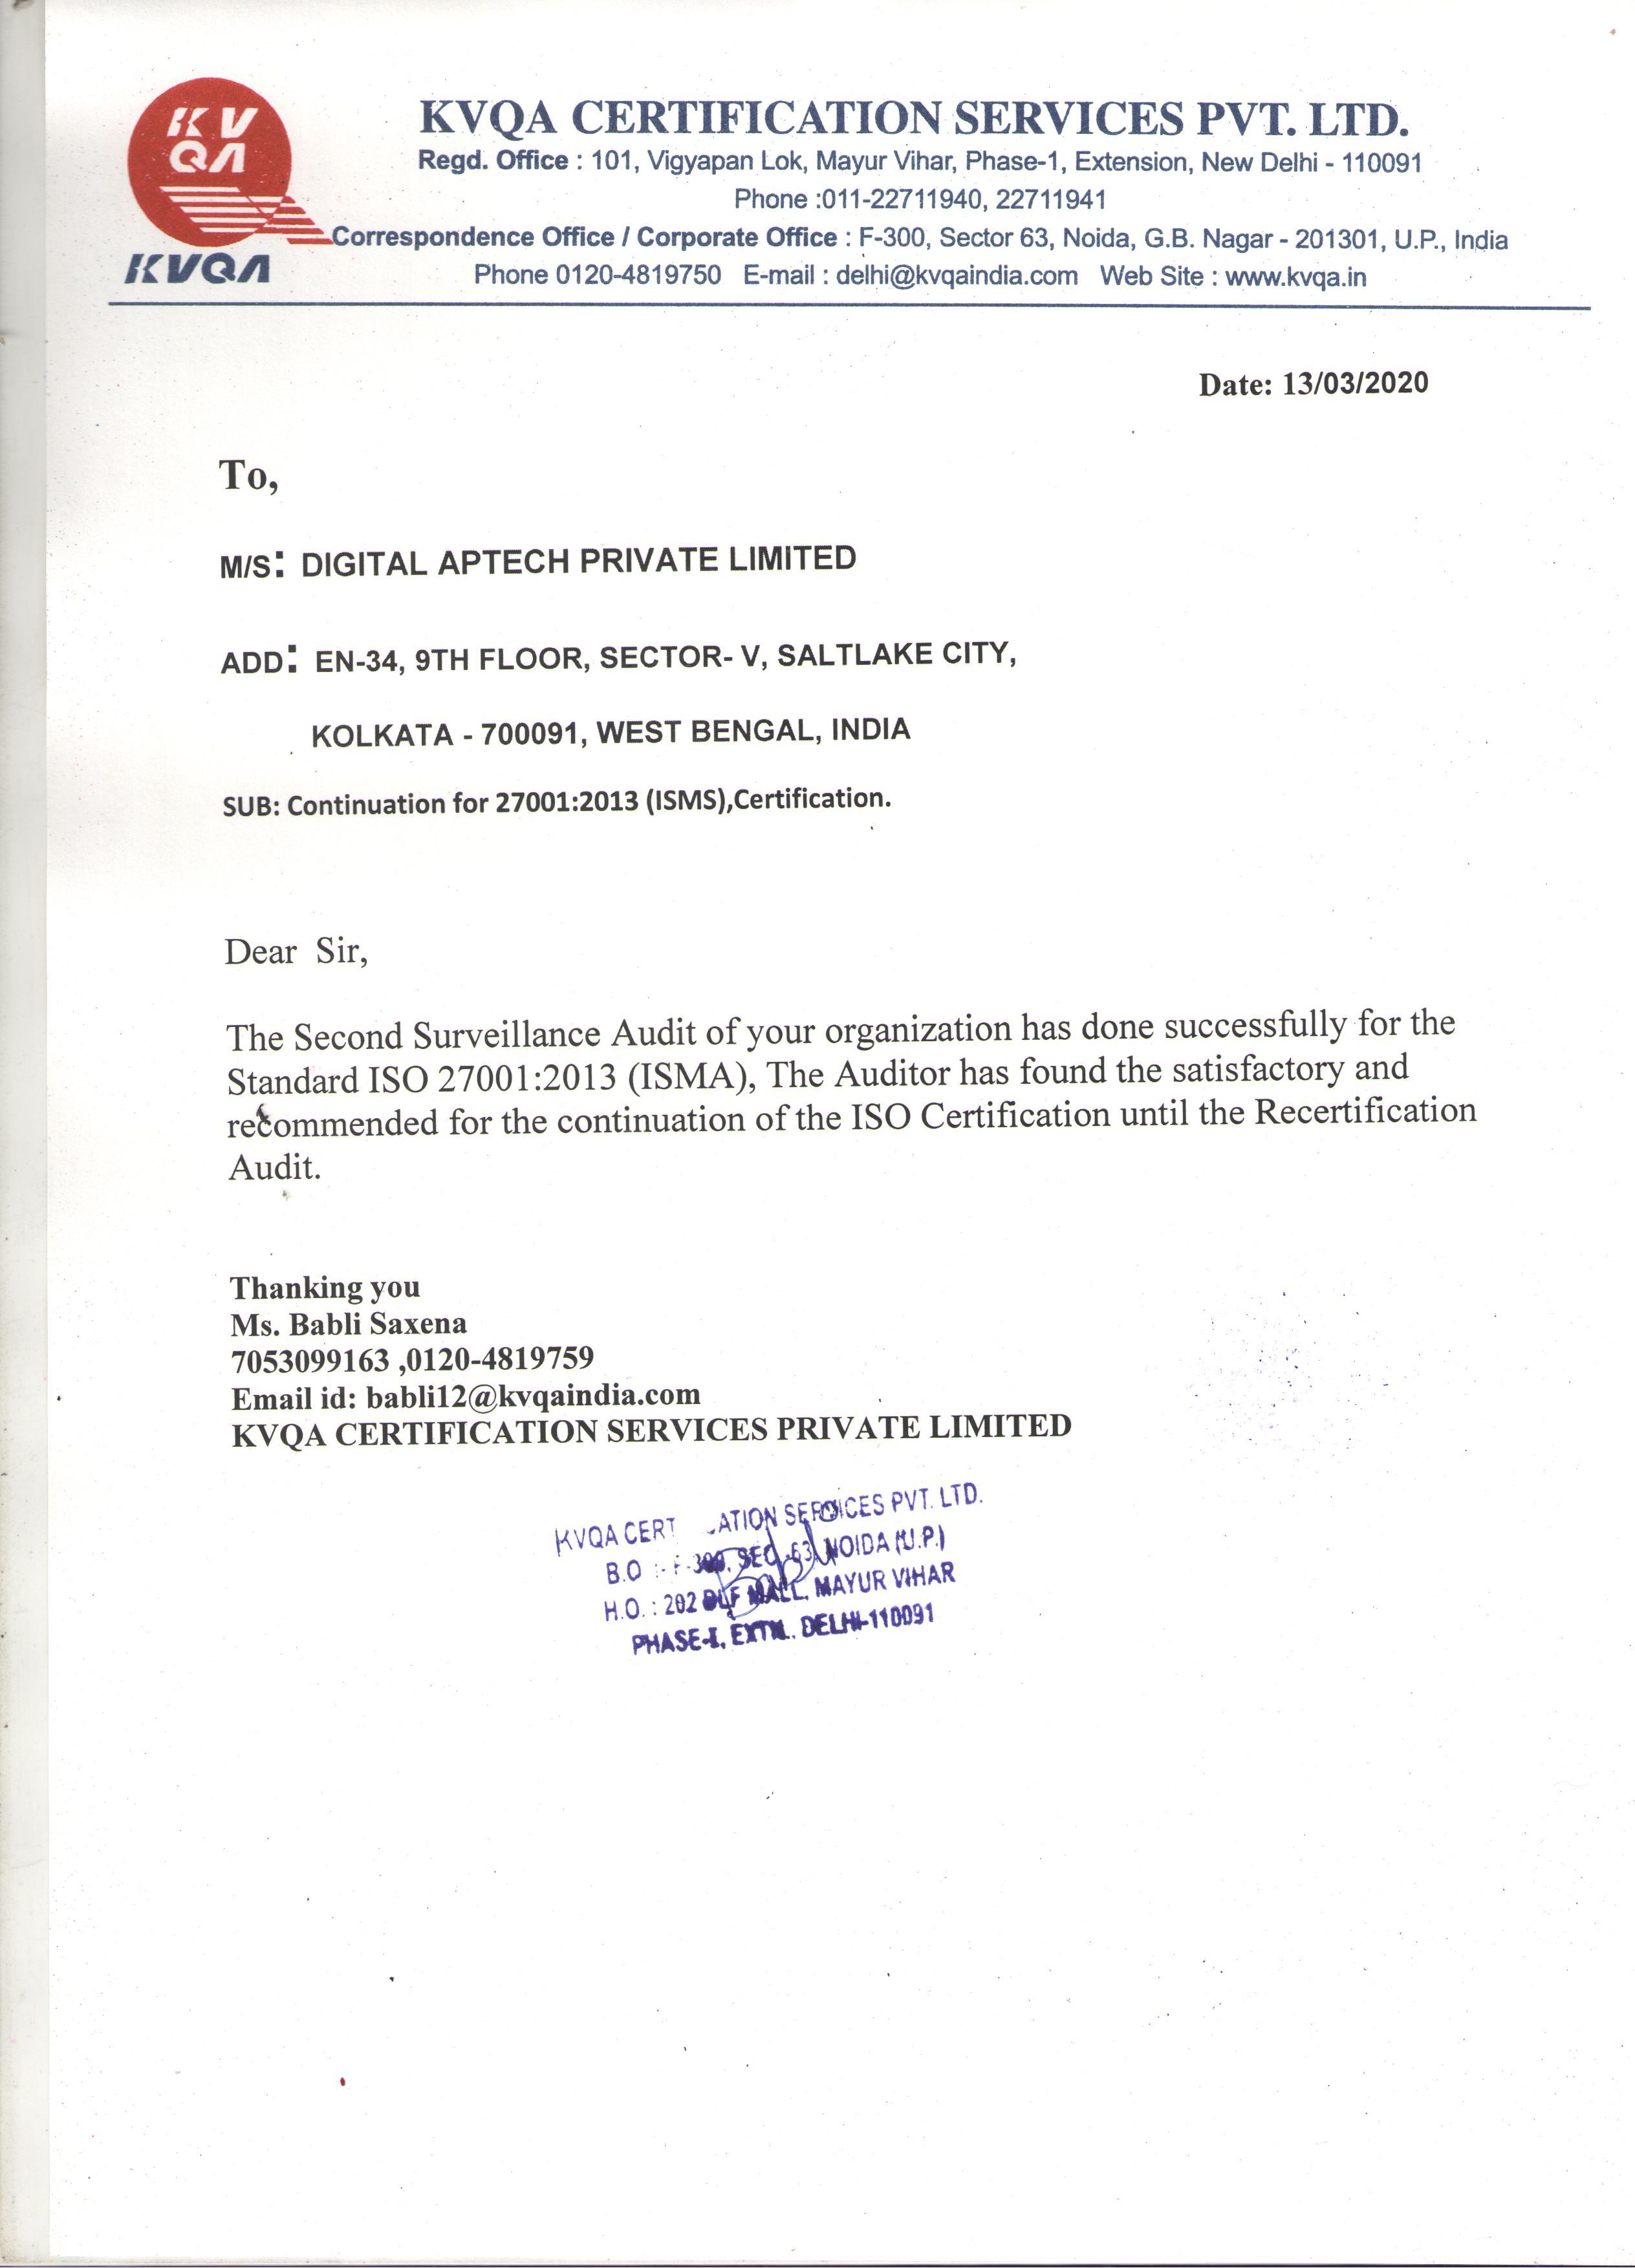 digitalaptech-27001-certificate